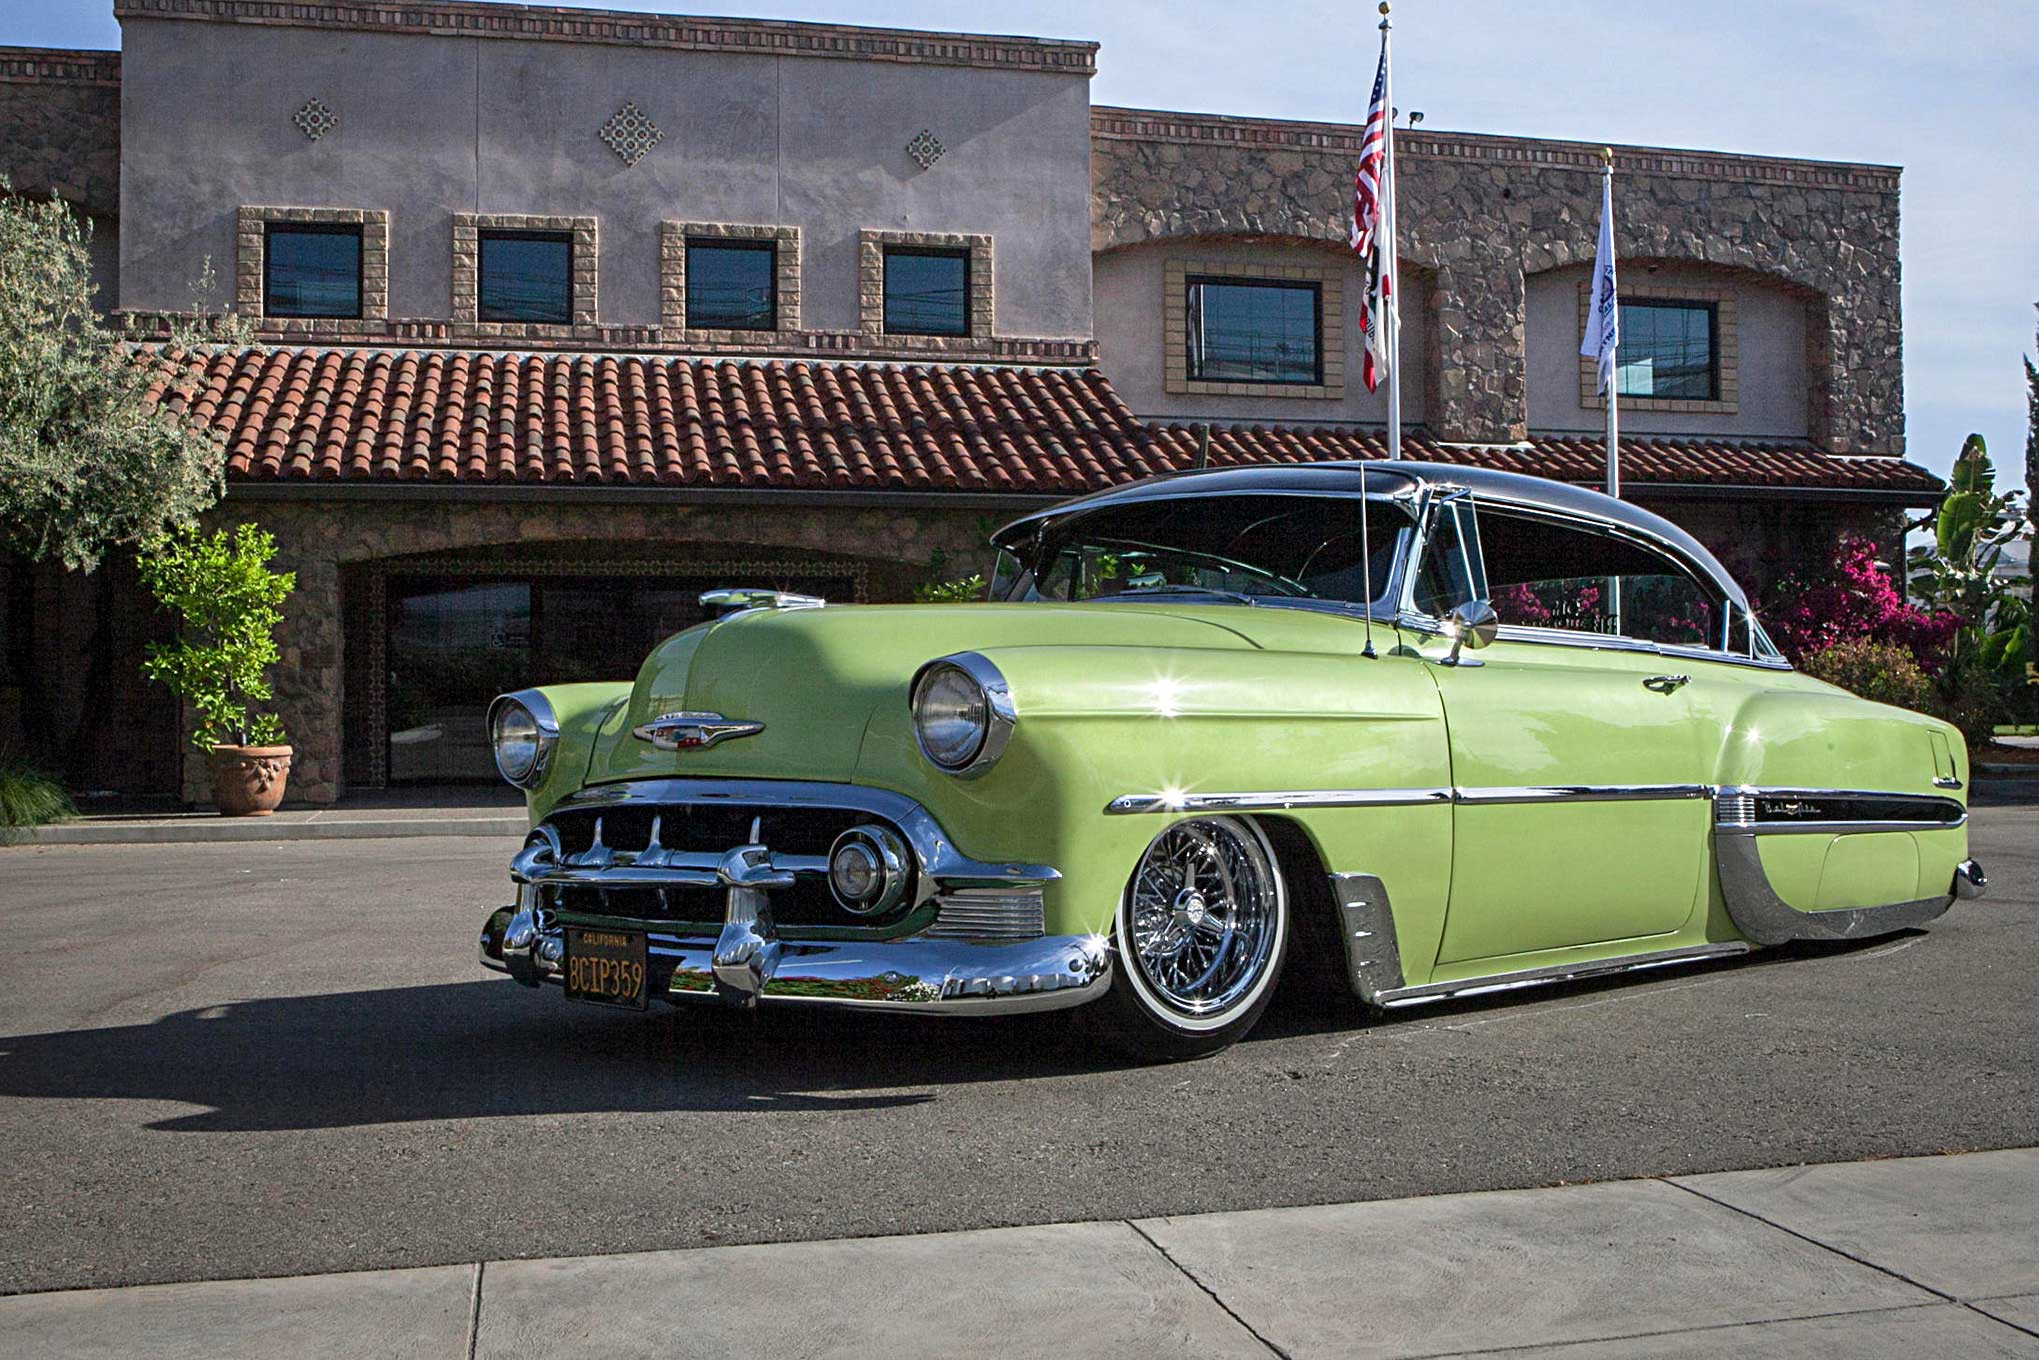 Kelebihan Chevrolet 1953 Tangguh